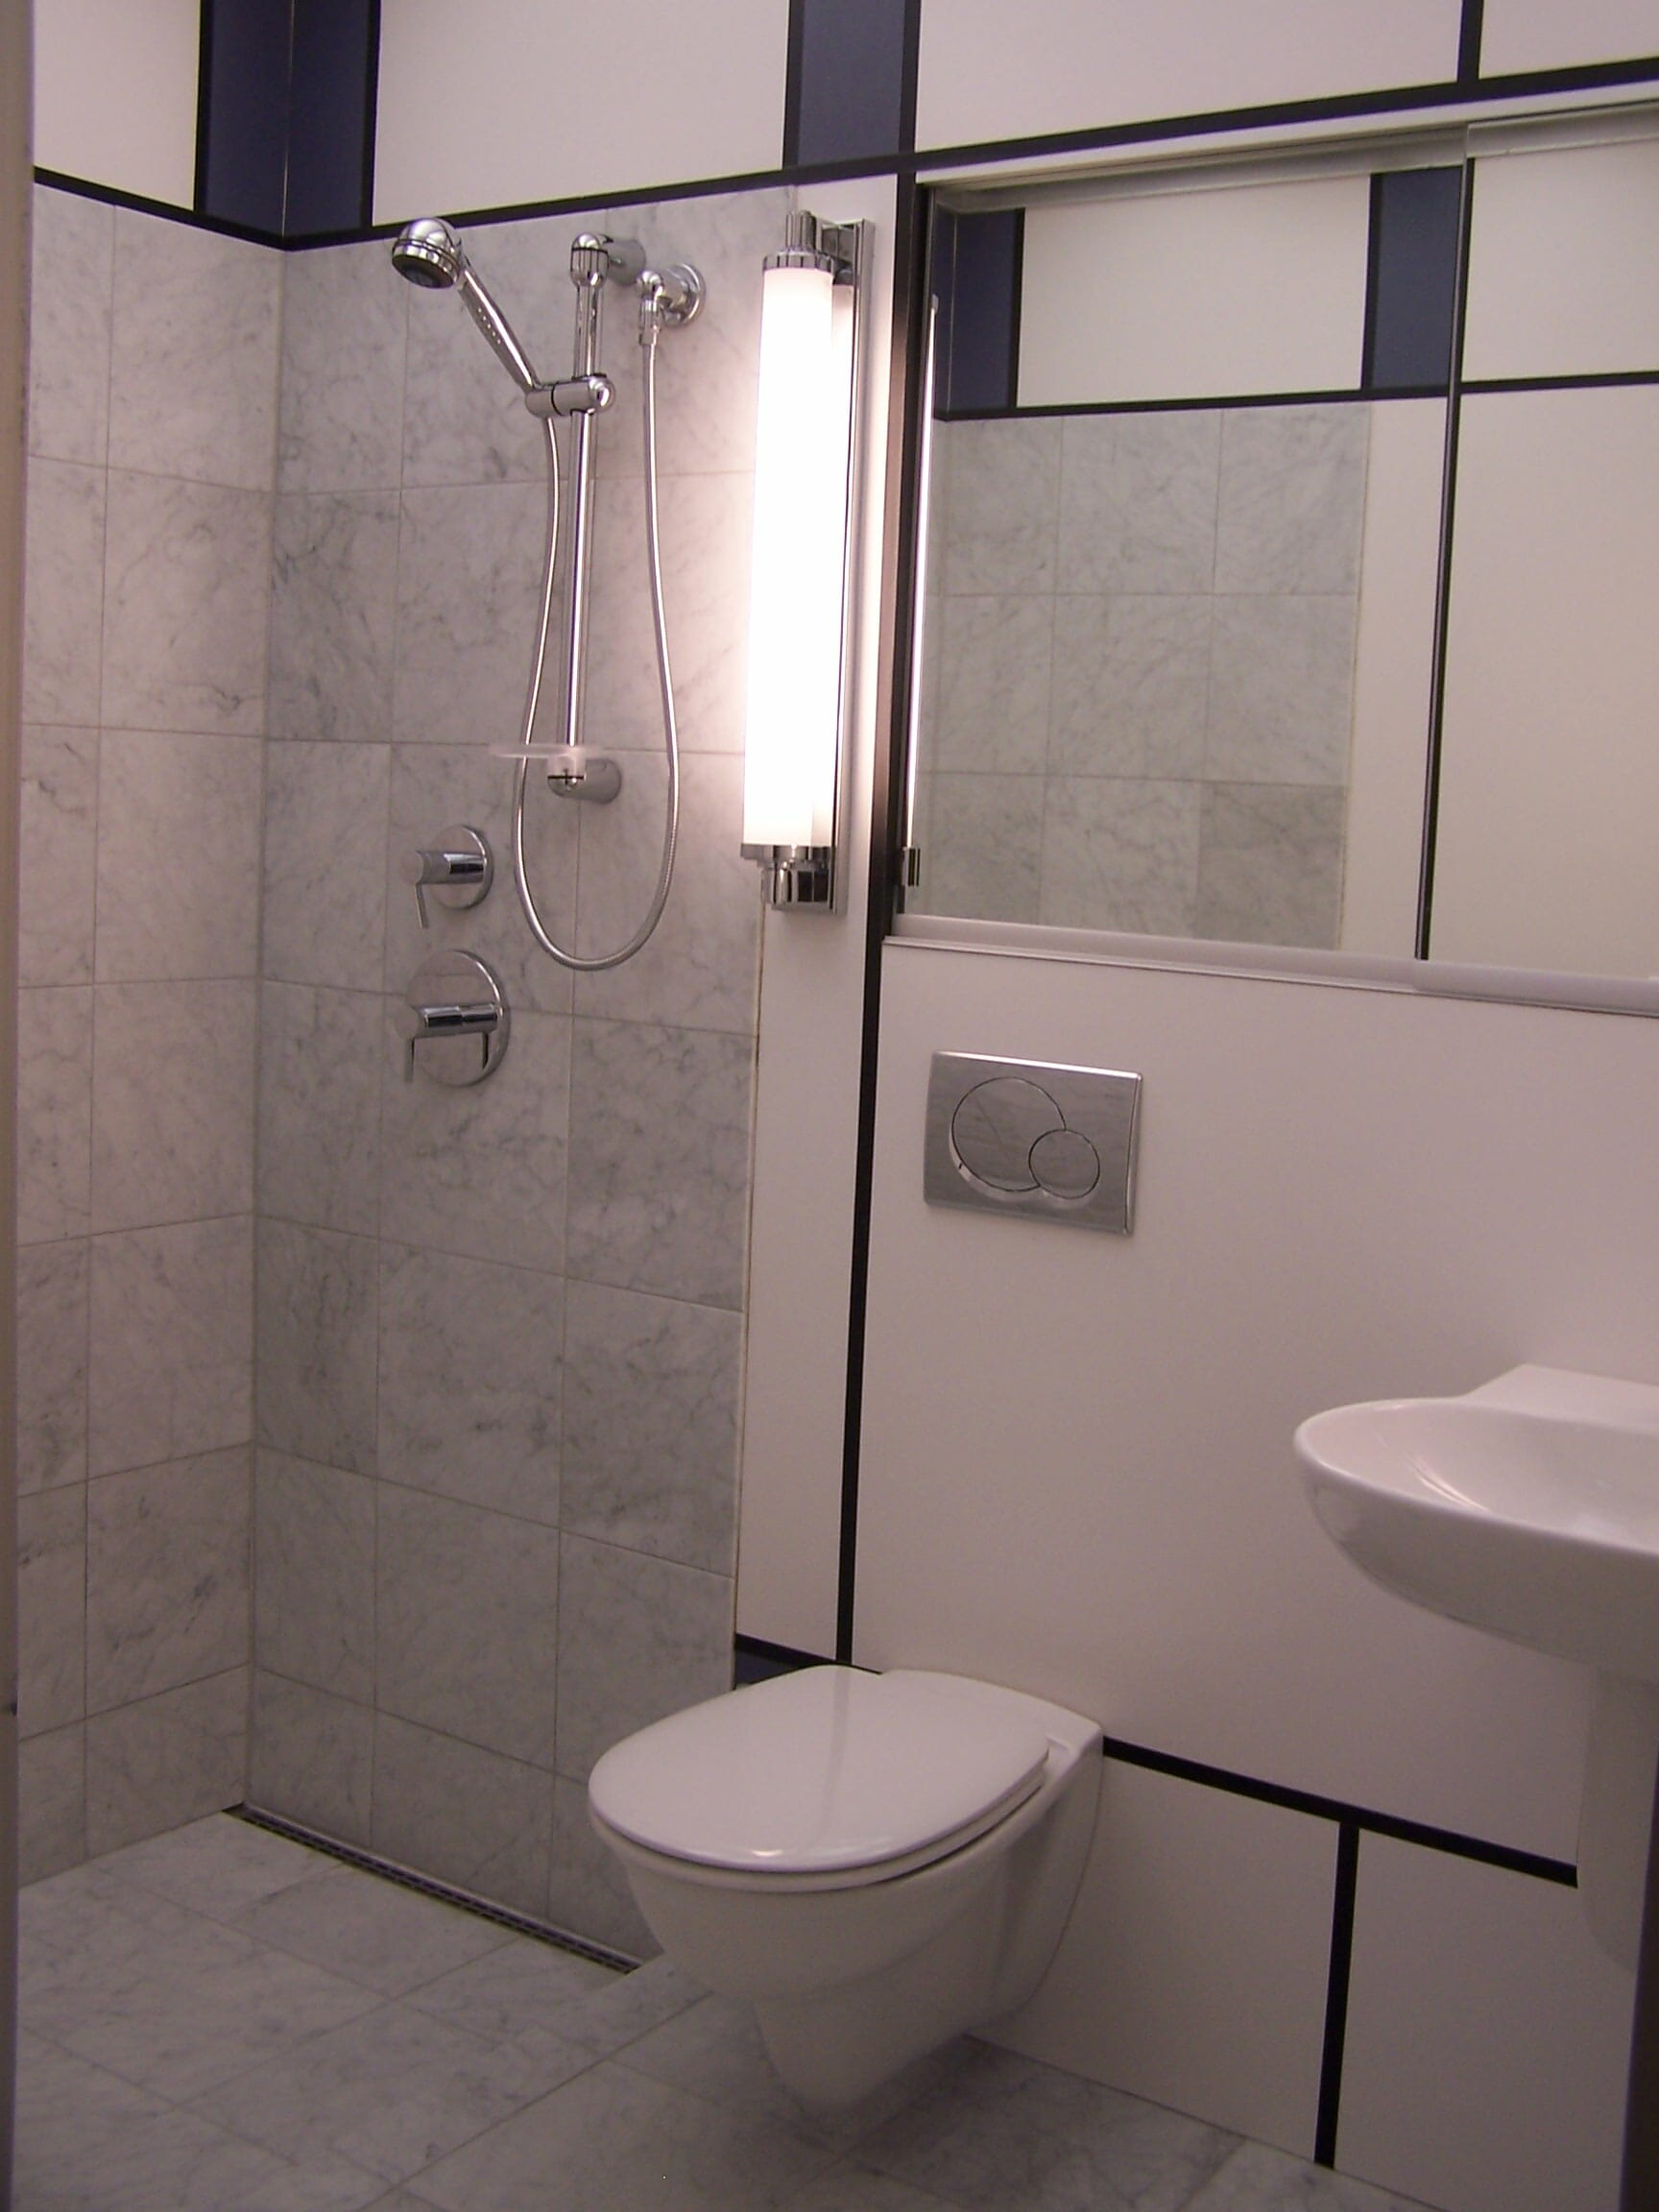 Steven Michael Create The Mondrian Bathroom Originally Intended For Their Alcoa Aluminum House